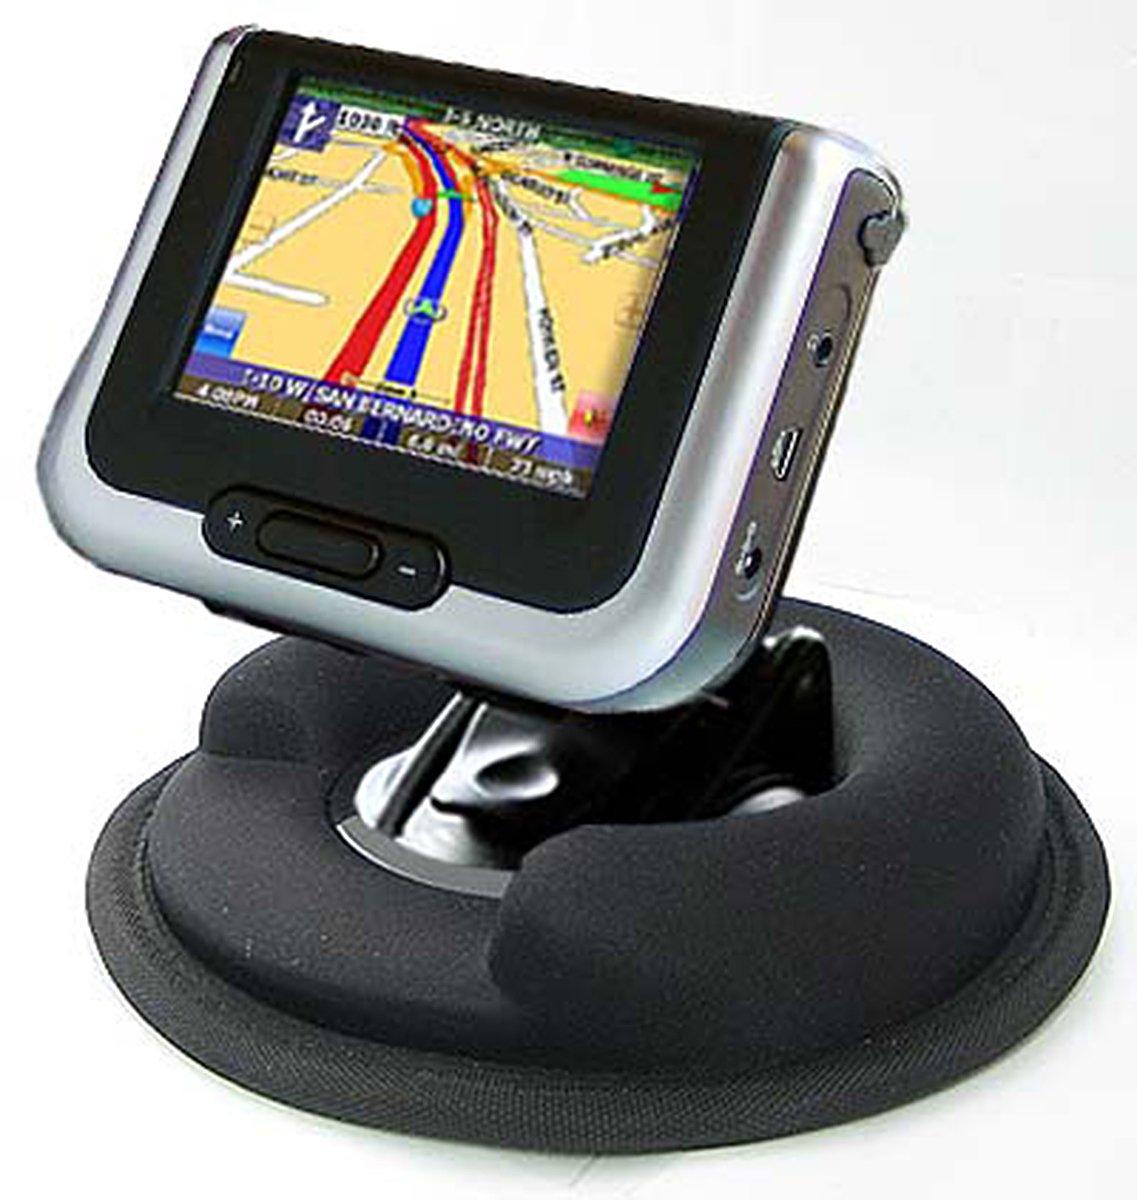 Zeikos IR-MAT36 Dash Mount Holder for GPS Black